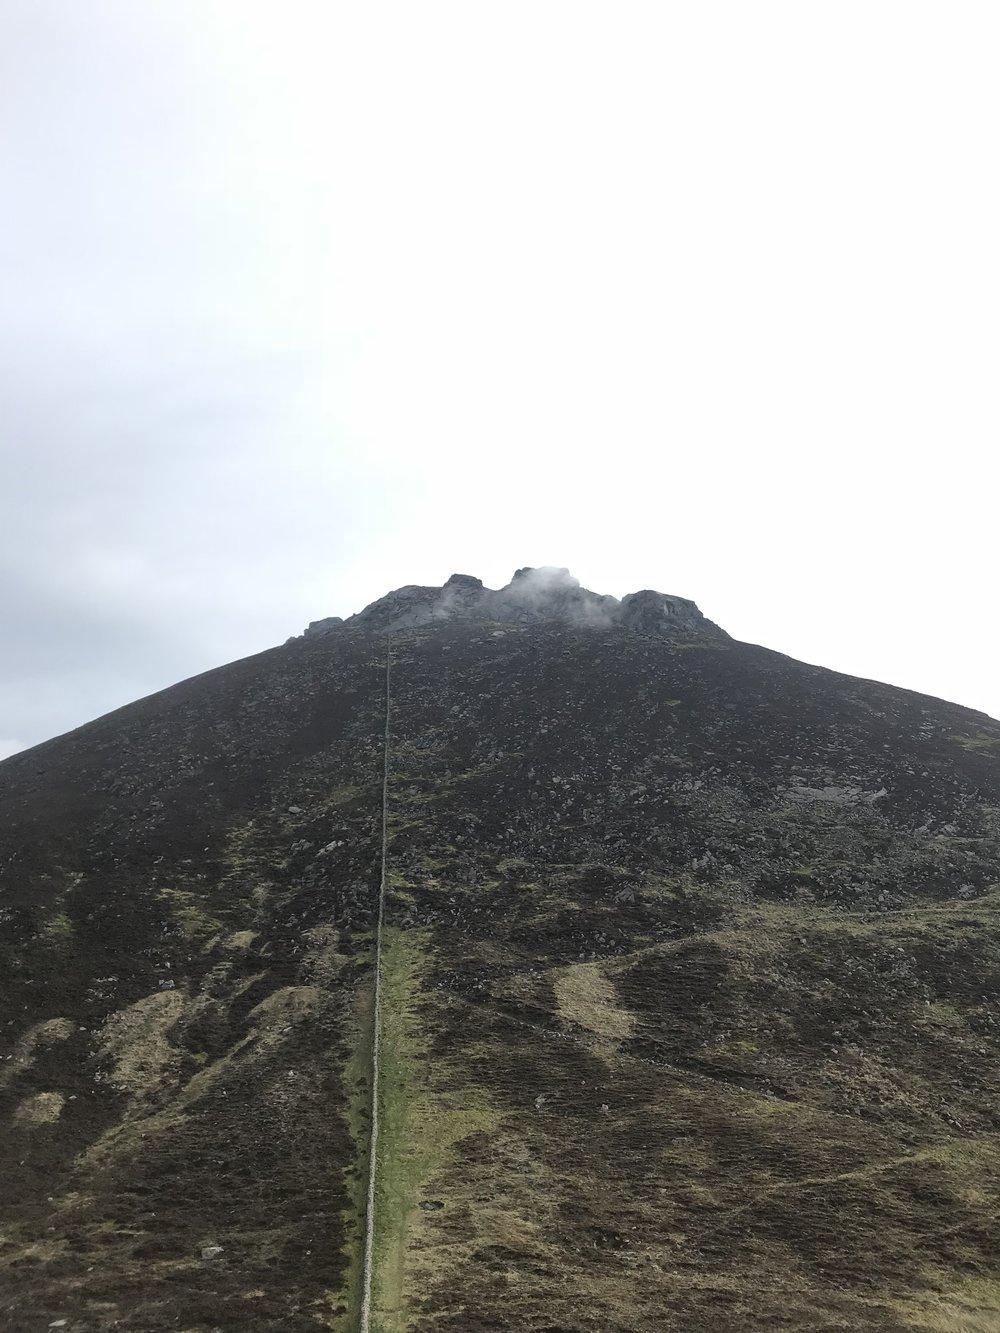 View of Slieve Binnian from Wee Binnian